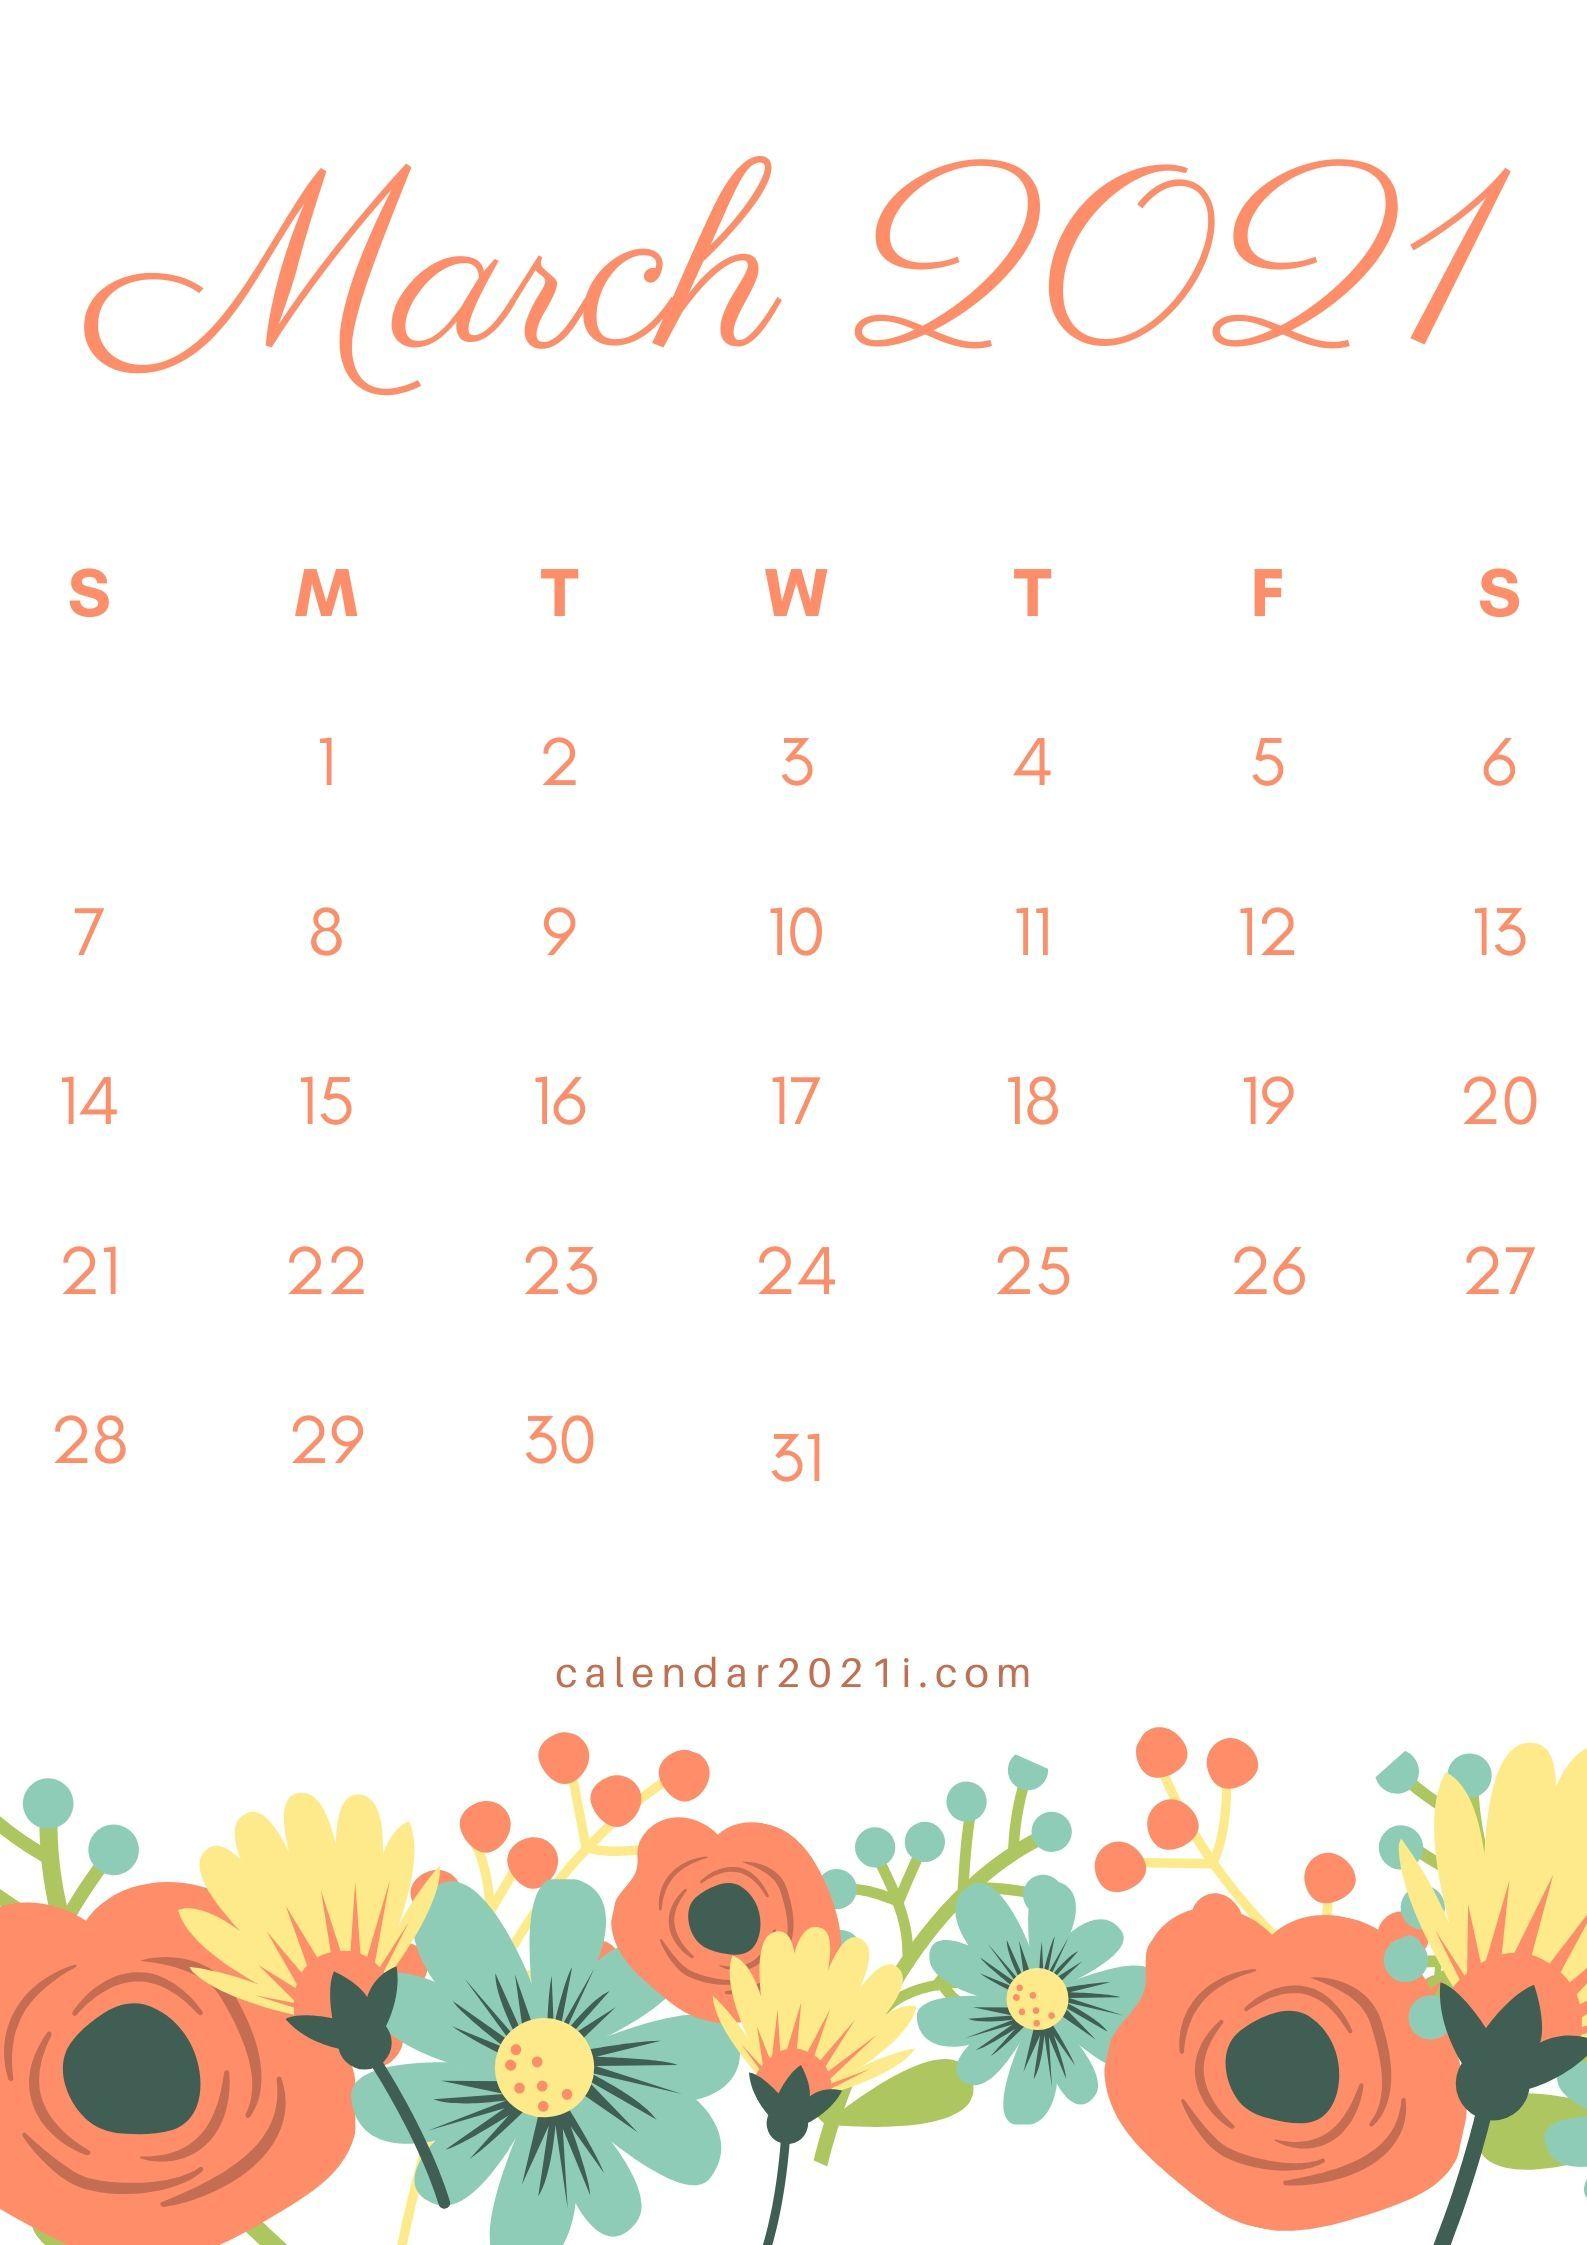 March 2021 Floral Calendar Printable Design Diy Template in Tropical Floral: Calendar 2021 Monthly